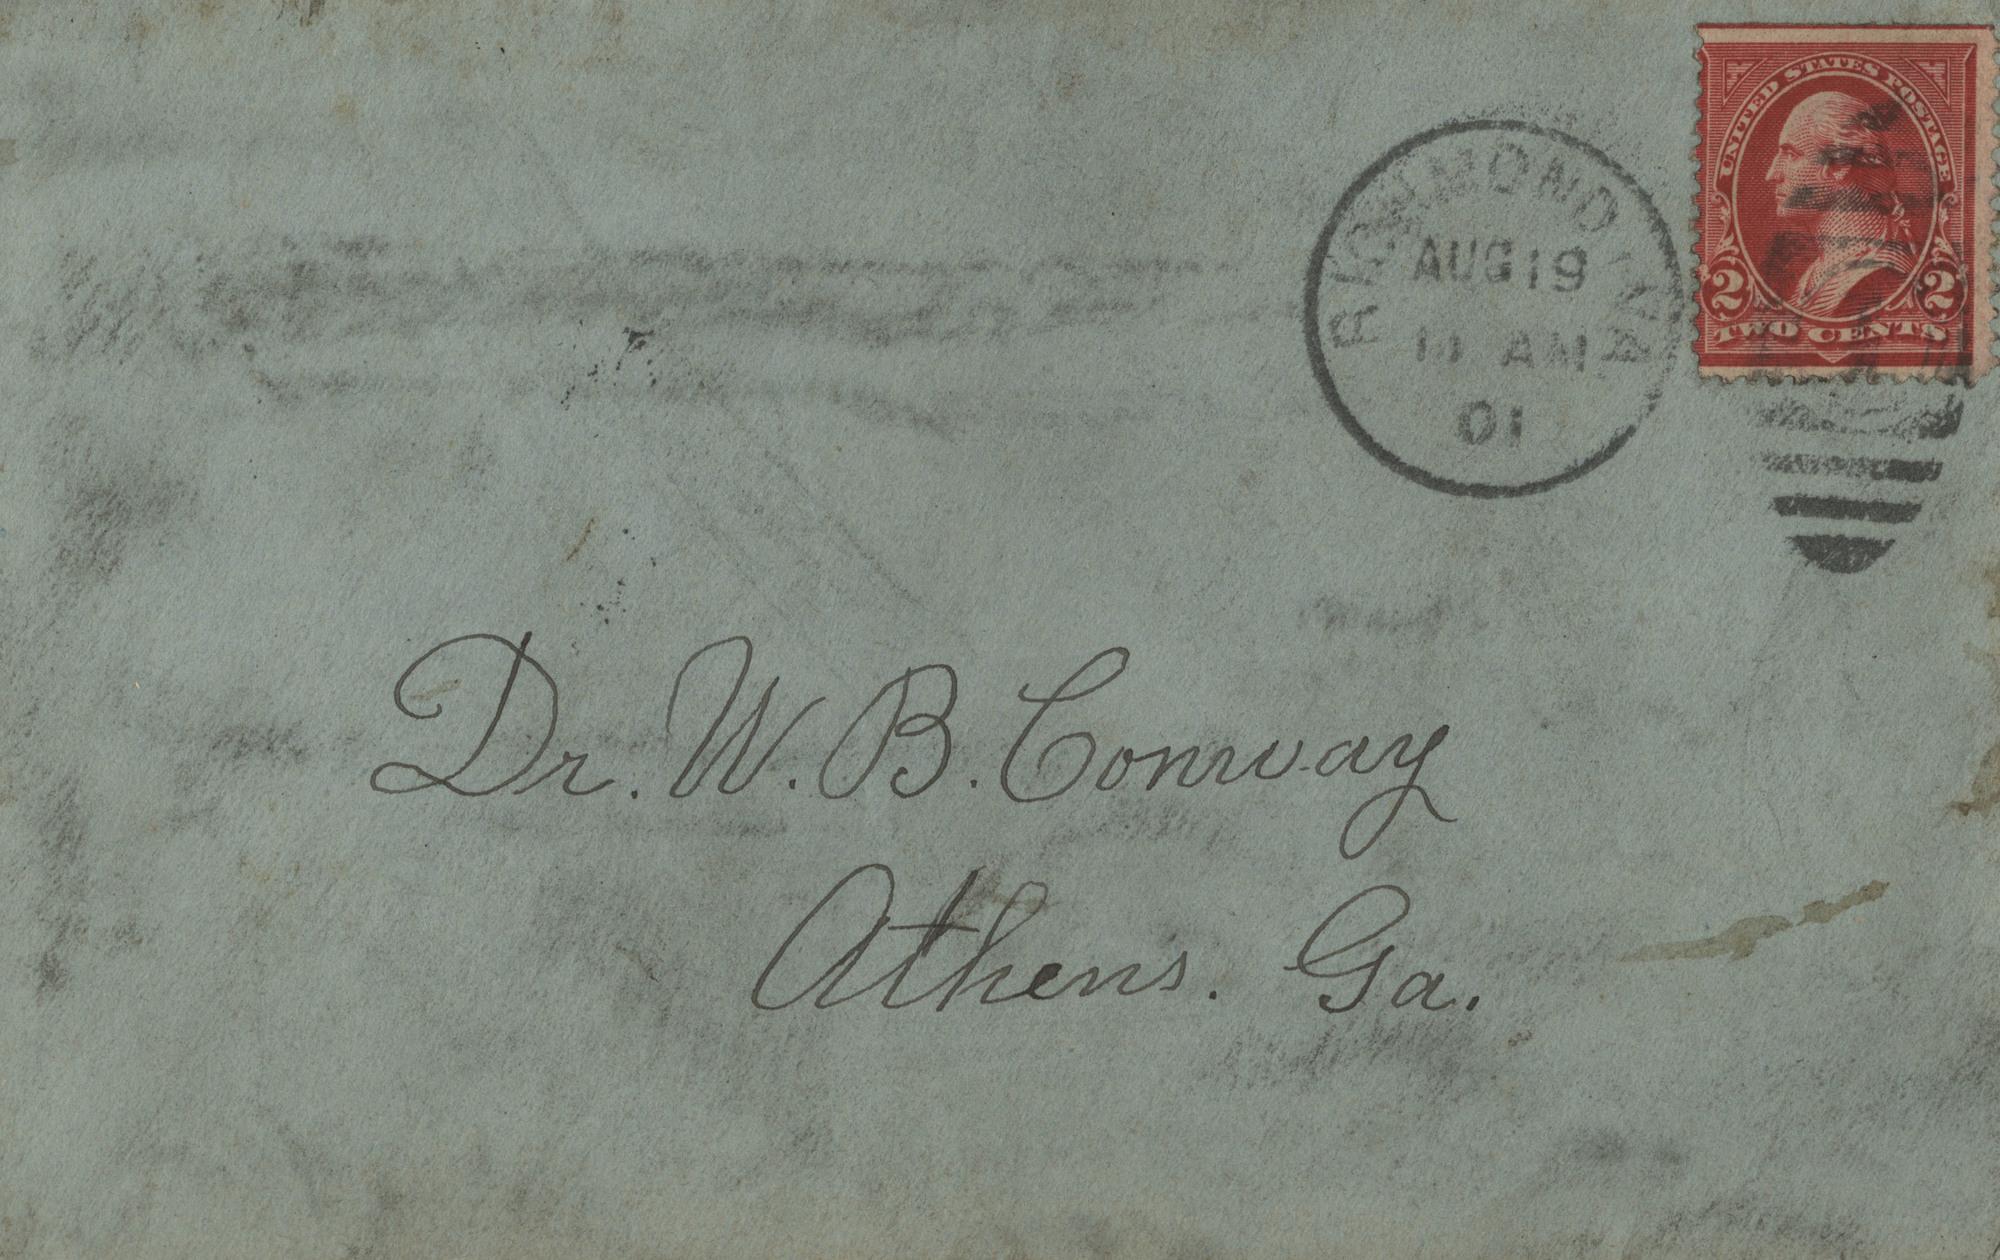 http://spec.lib.vt.edu/pickup/Omeka_upload/Ms2012-039_ConwayCatlett_F3_Letter_1901_0808_enva.jpg